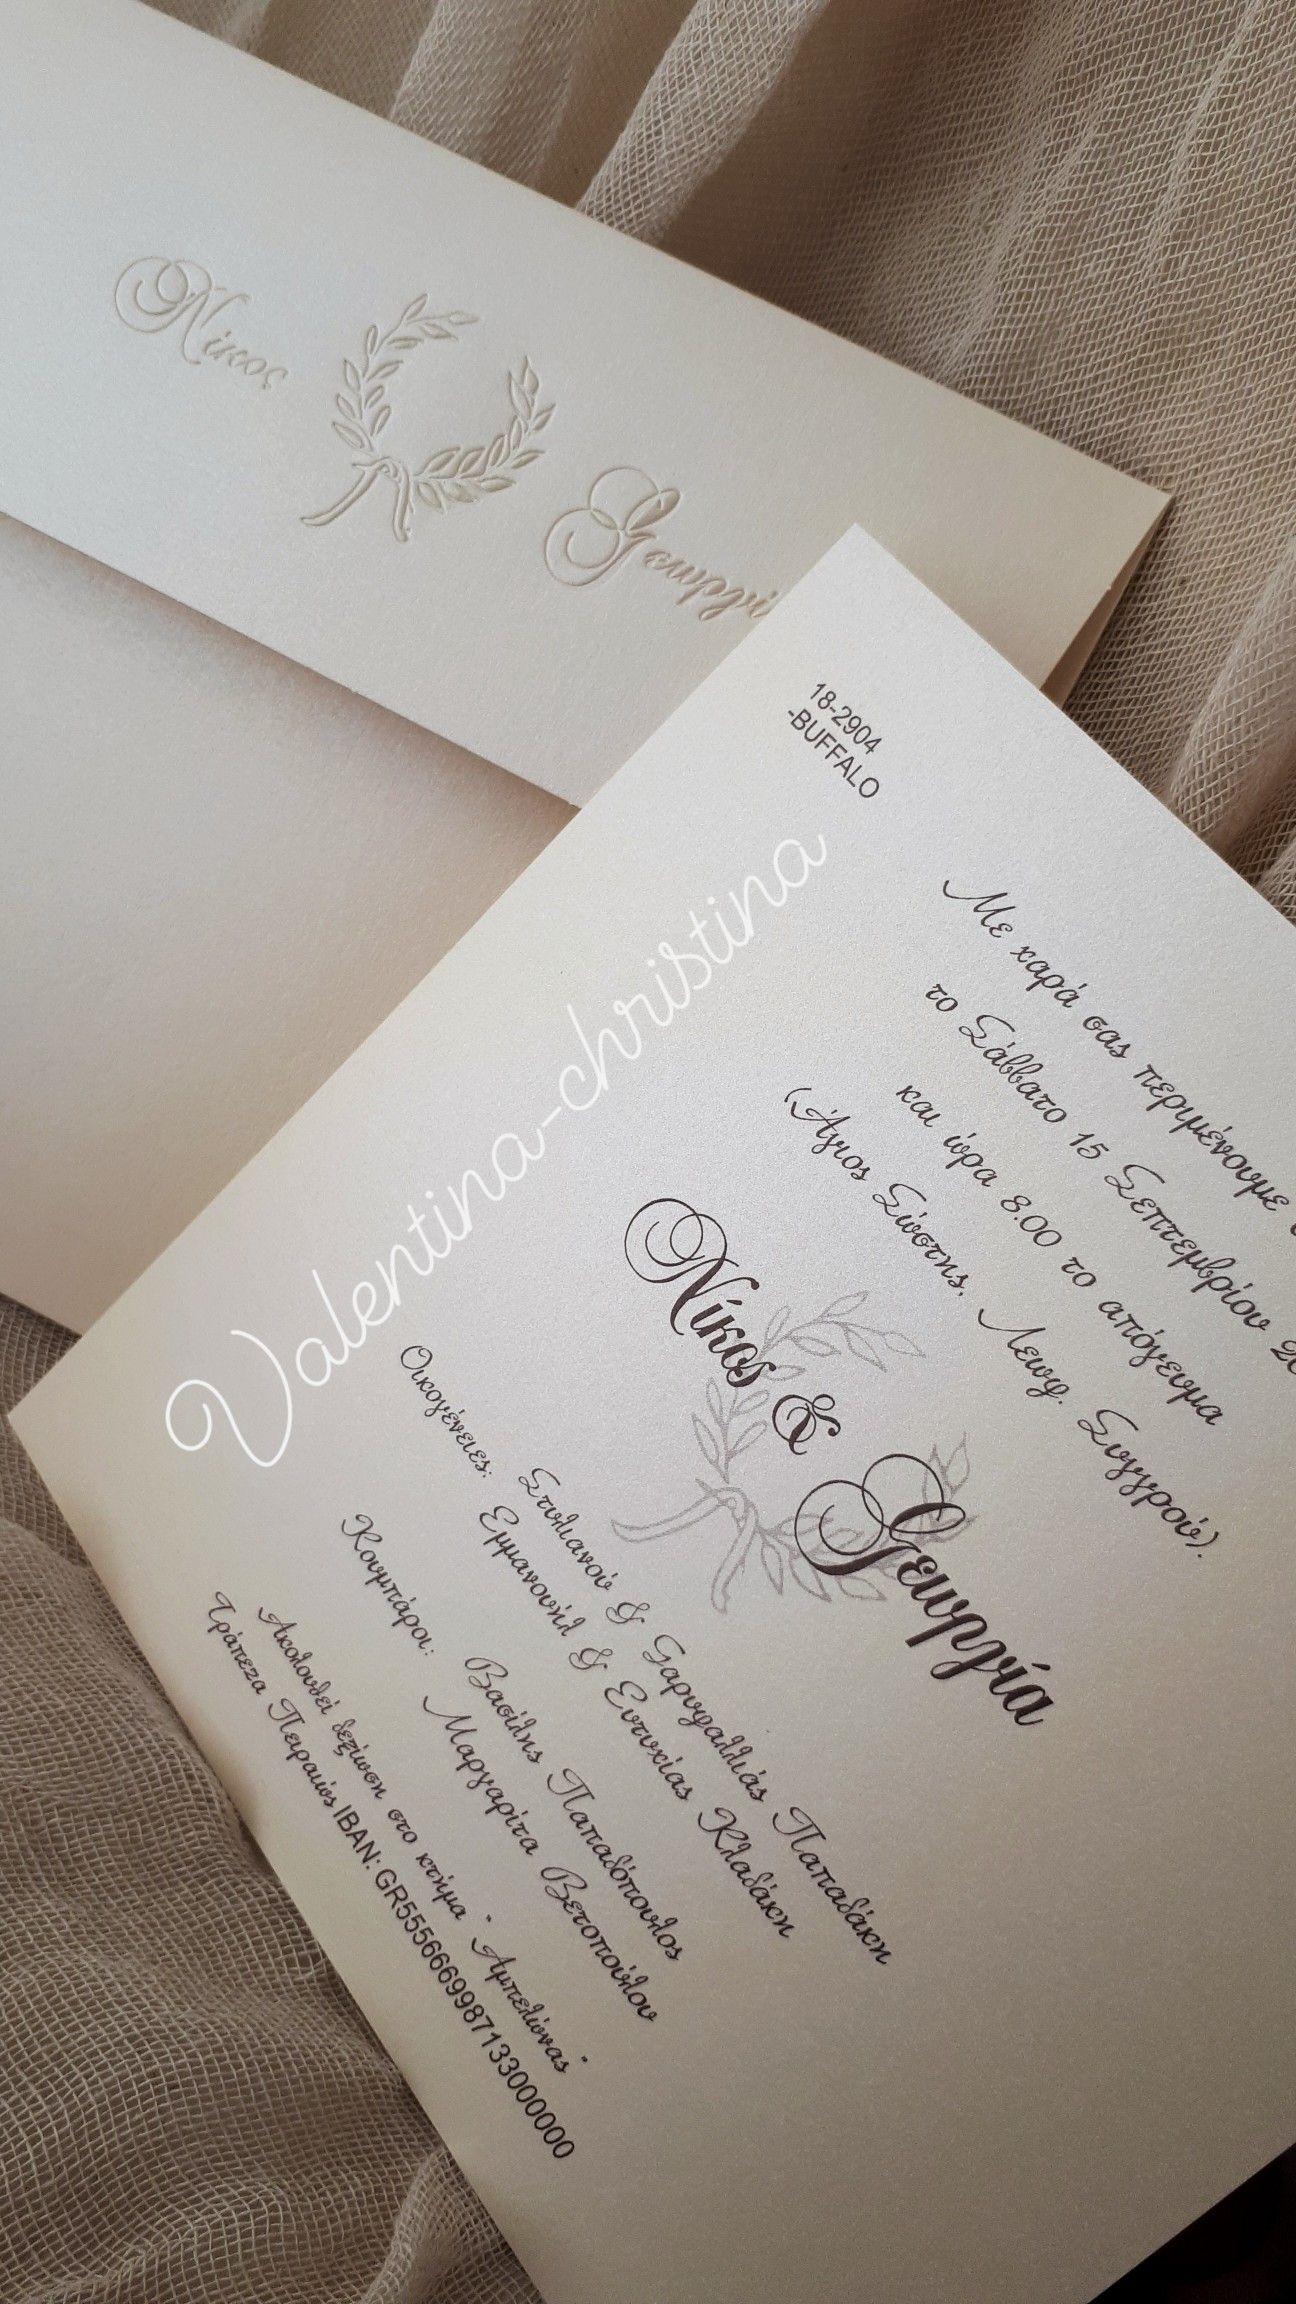 7664bcf32404 Κλασικά πρόσκλητηρια γάμου κόντρα μεταλιζε χάρτη με θέμα το στεφανακι ελιάς  class and chic by valentina